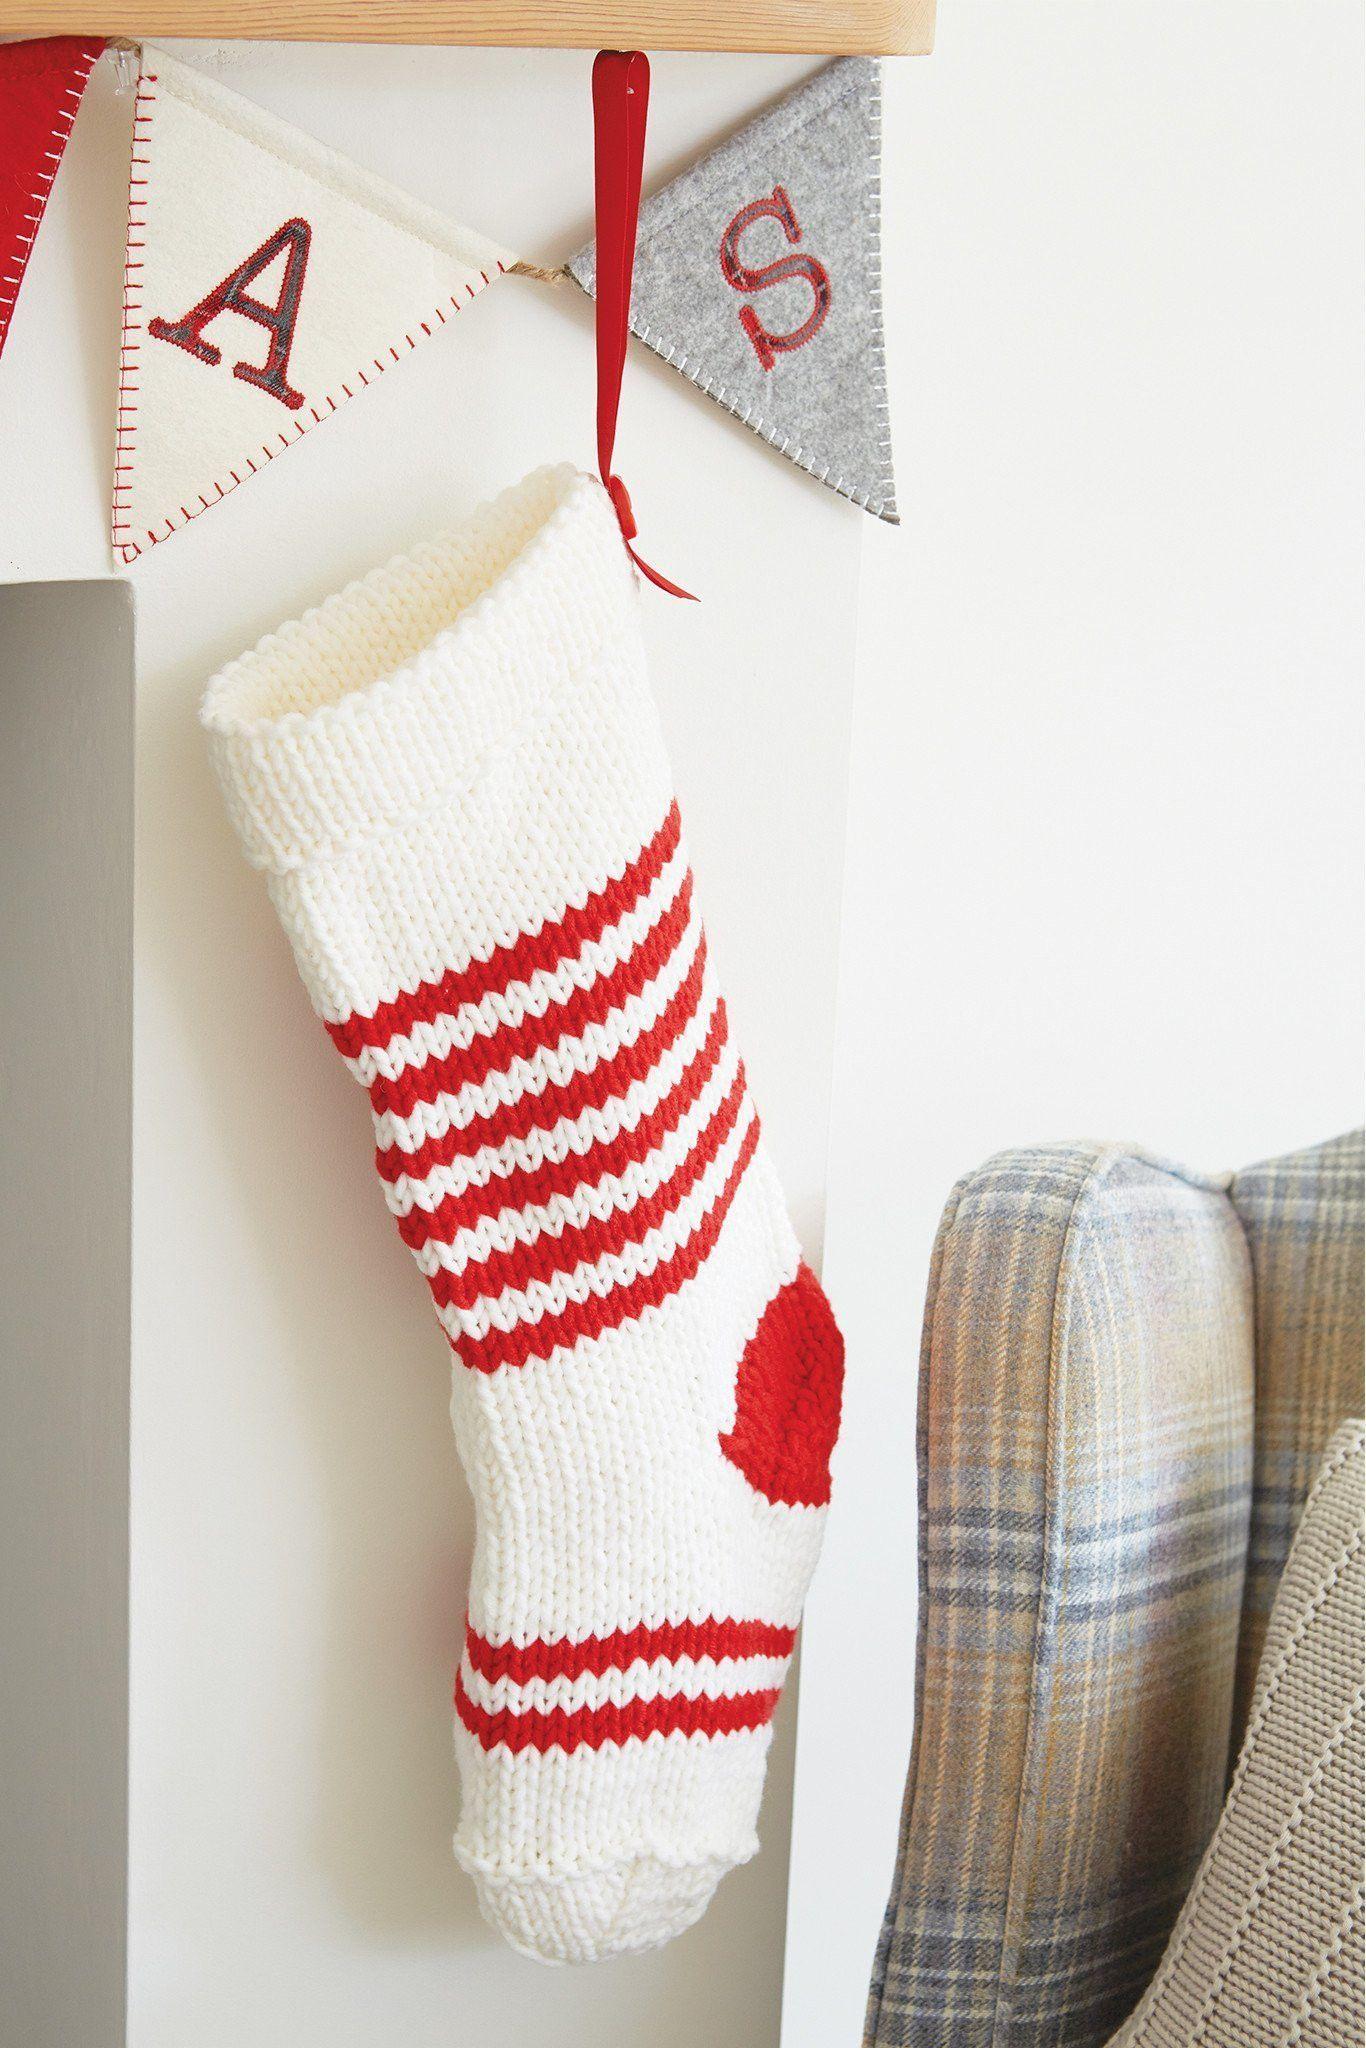 Christmas Stocking Knitting Patterns The Knitting Network